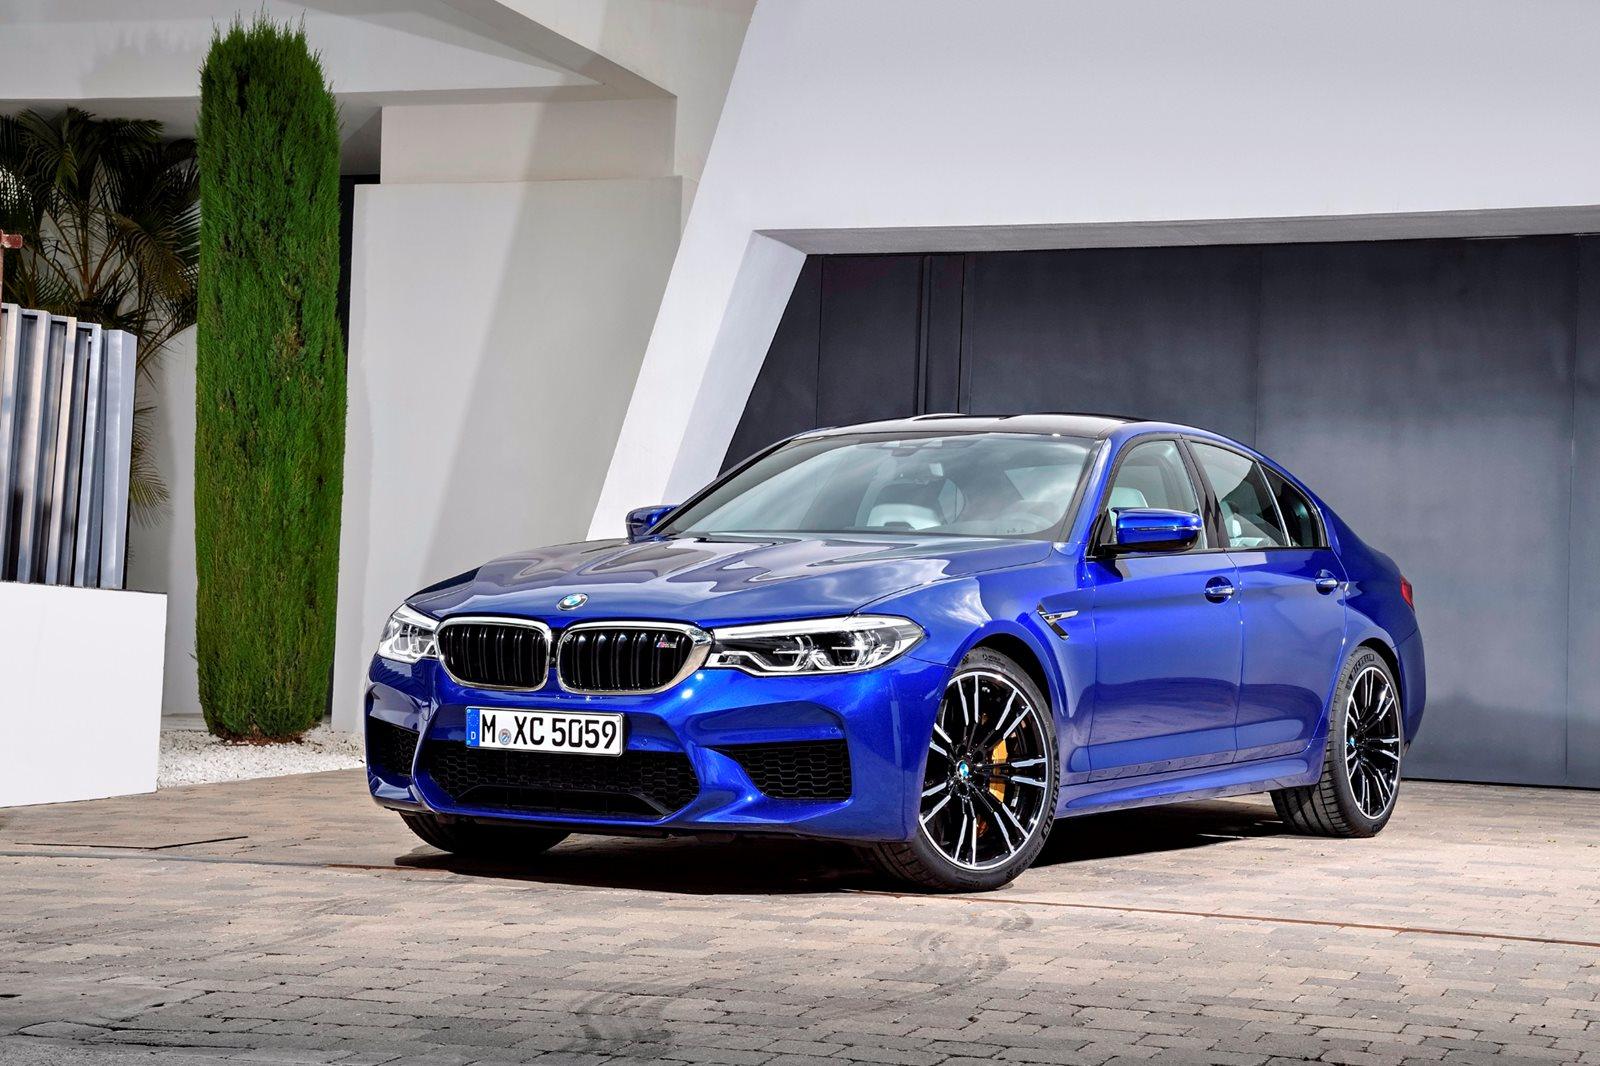 2018 BMW M5 Sedan Review,Trims, Specs And Price